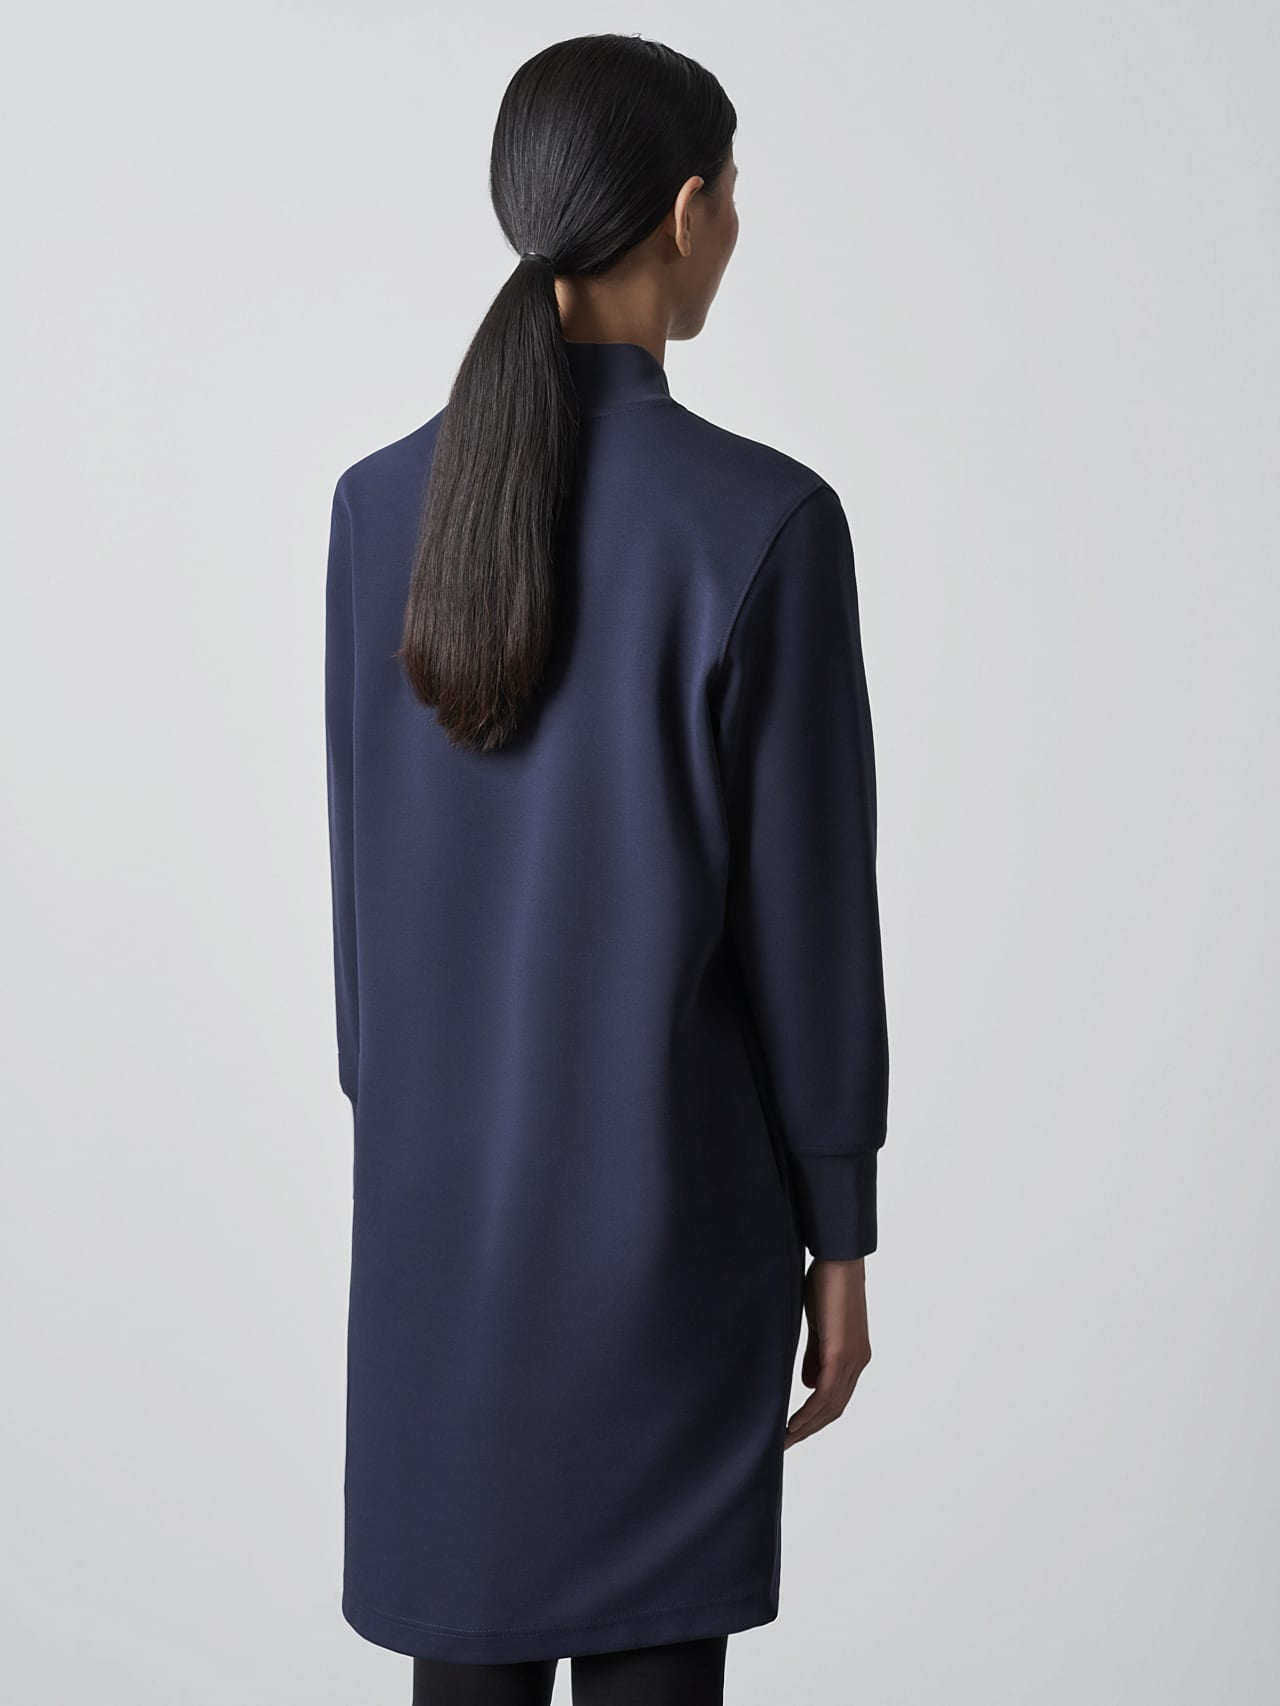 STAR V3.Y5.02 Premium Logo Sweater Dress navy Front Main Alpha Tauri